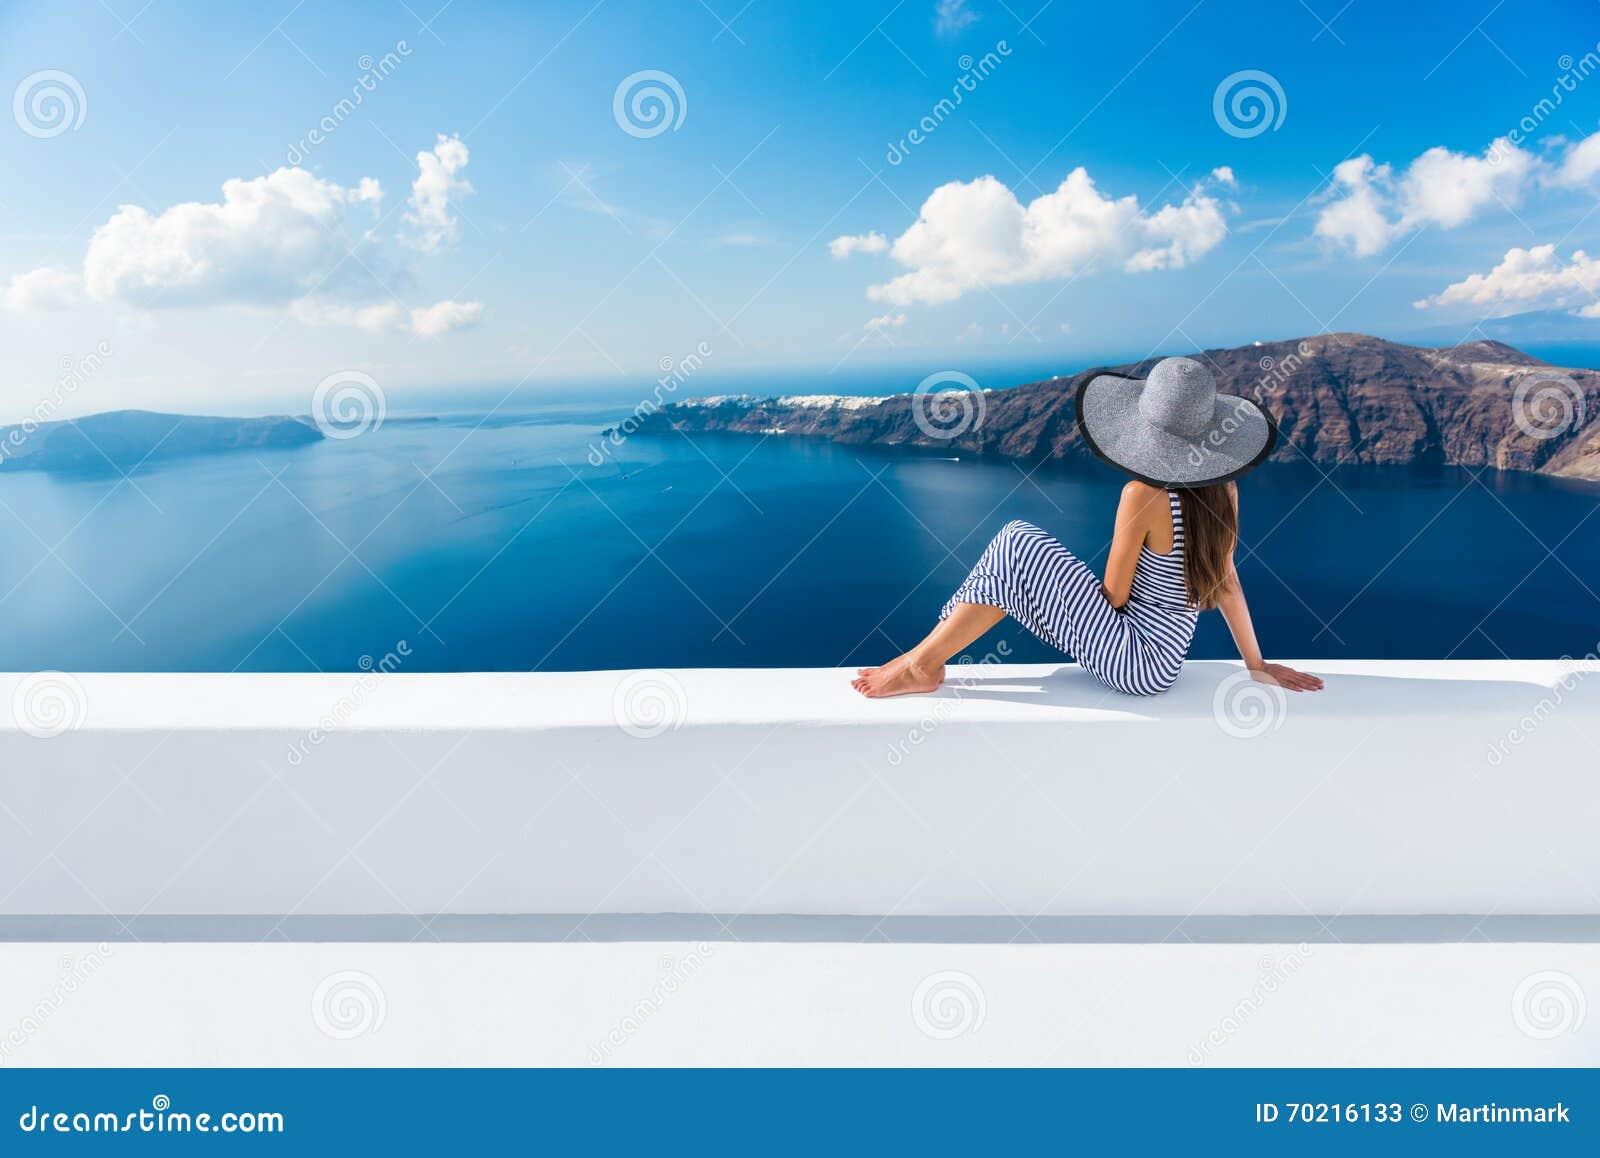 Reiseferien Europas Griechenland Santorini - Frau